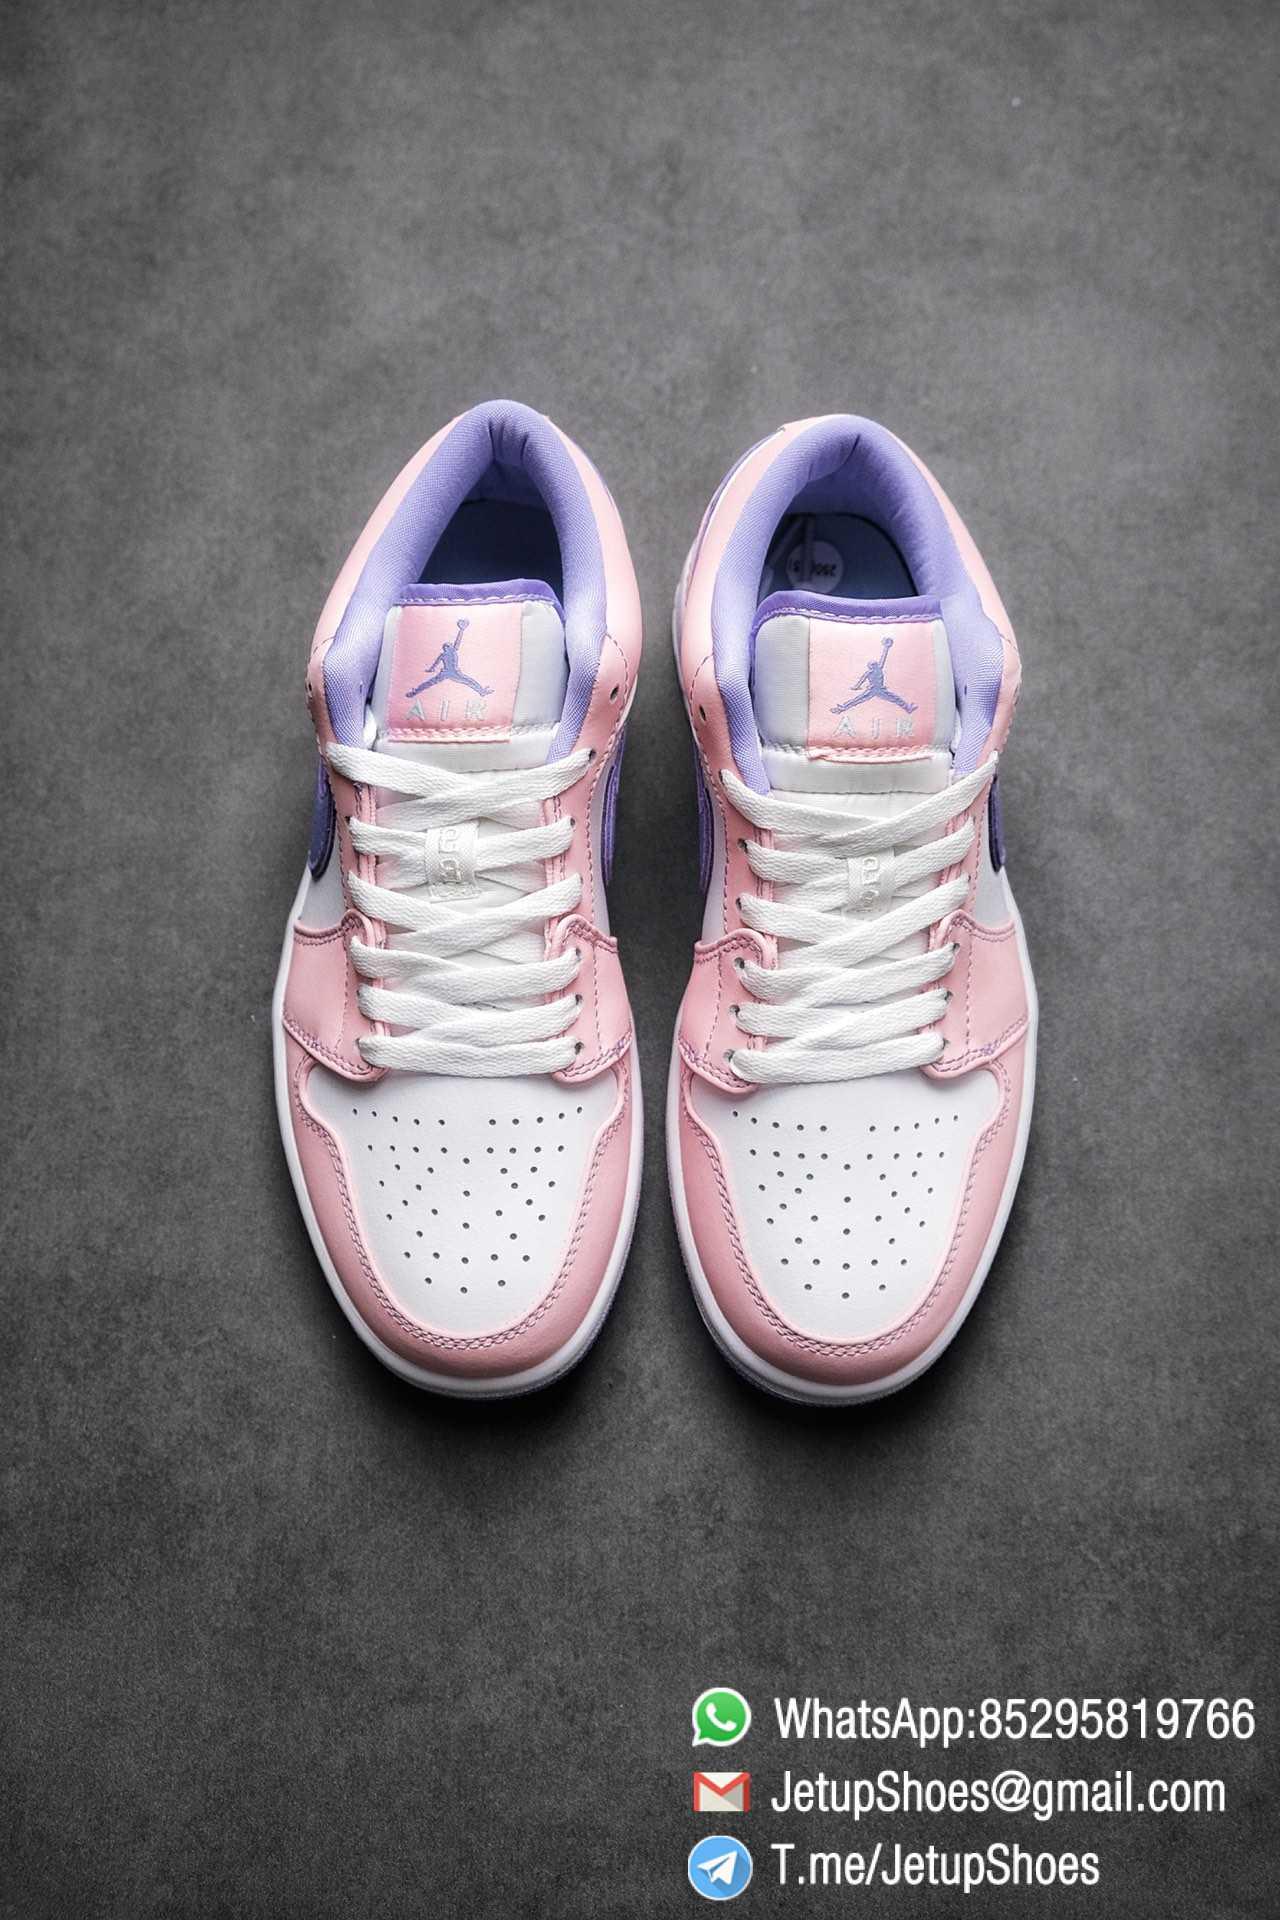 Best Replica Air Jordan 1 Low SE Arctic Punch Crisp White Upper Soft Pink Overlays Top Quality Supplier 02